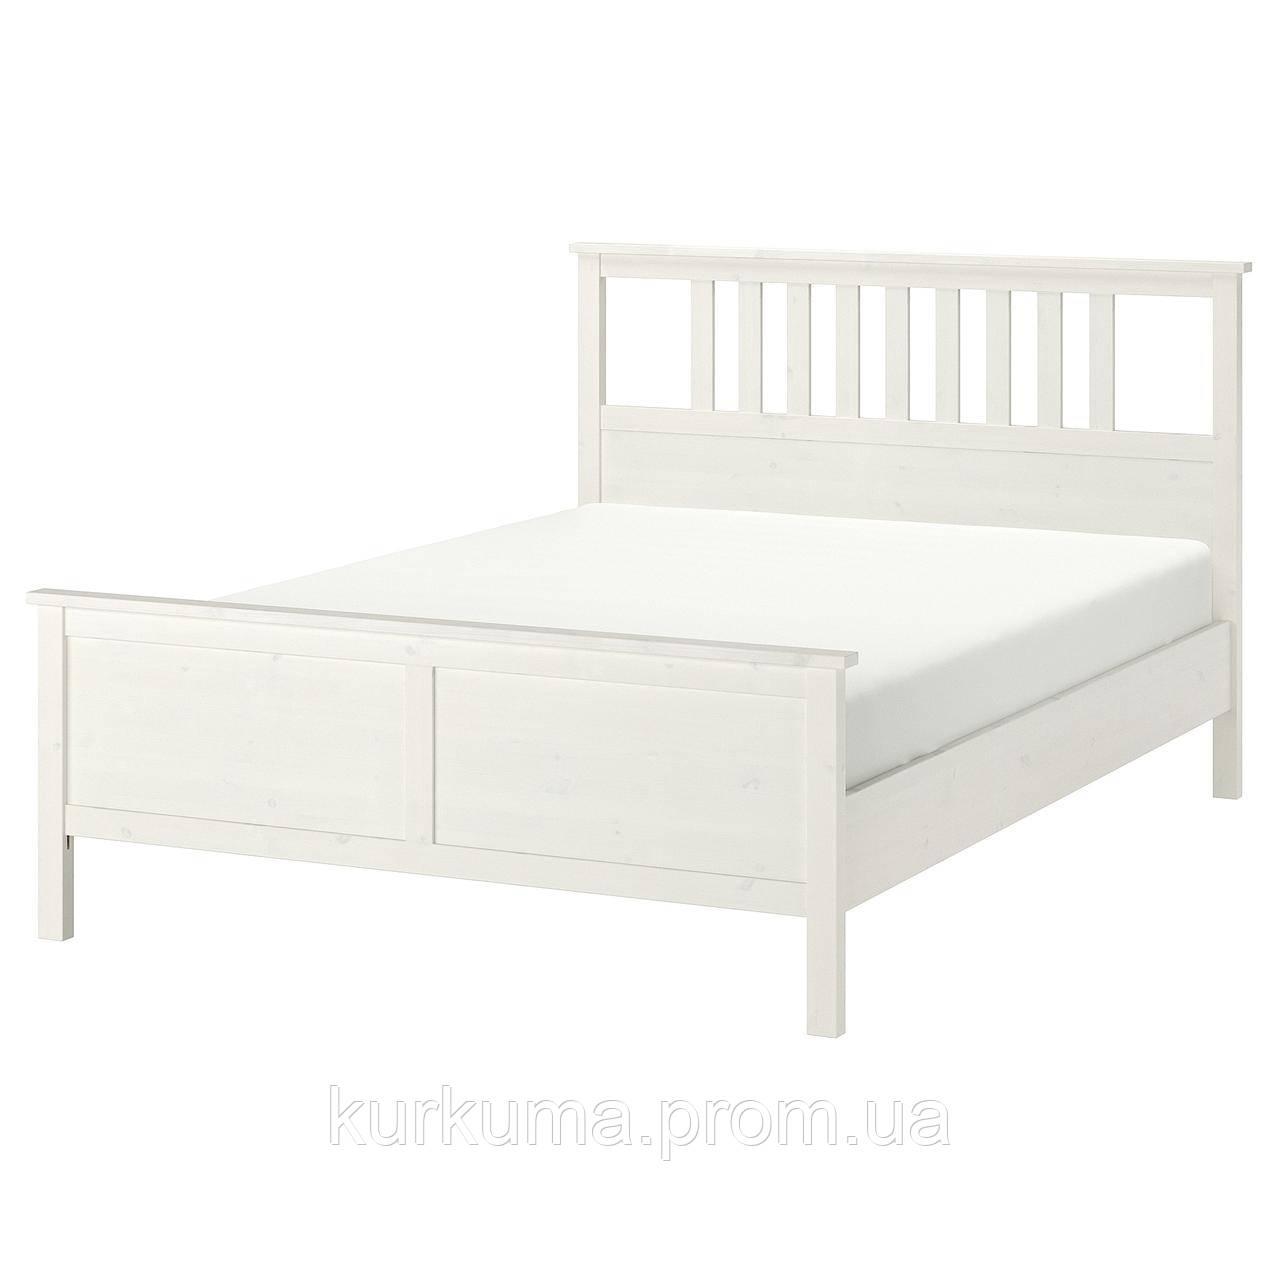 IKEA HEMNES Кровать, белая Морилка, Леирсунд  (290.197.92)